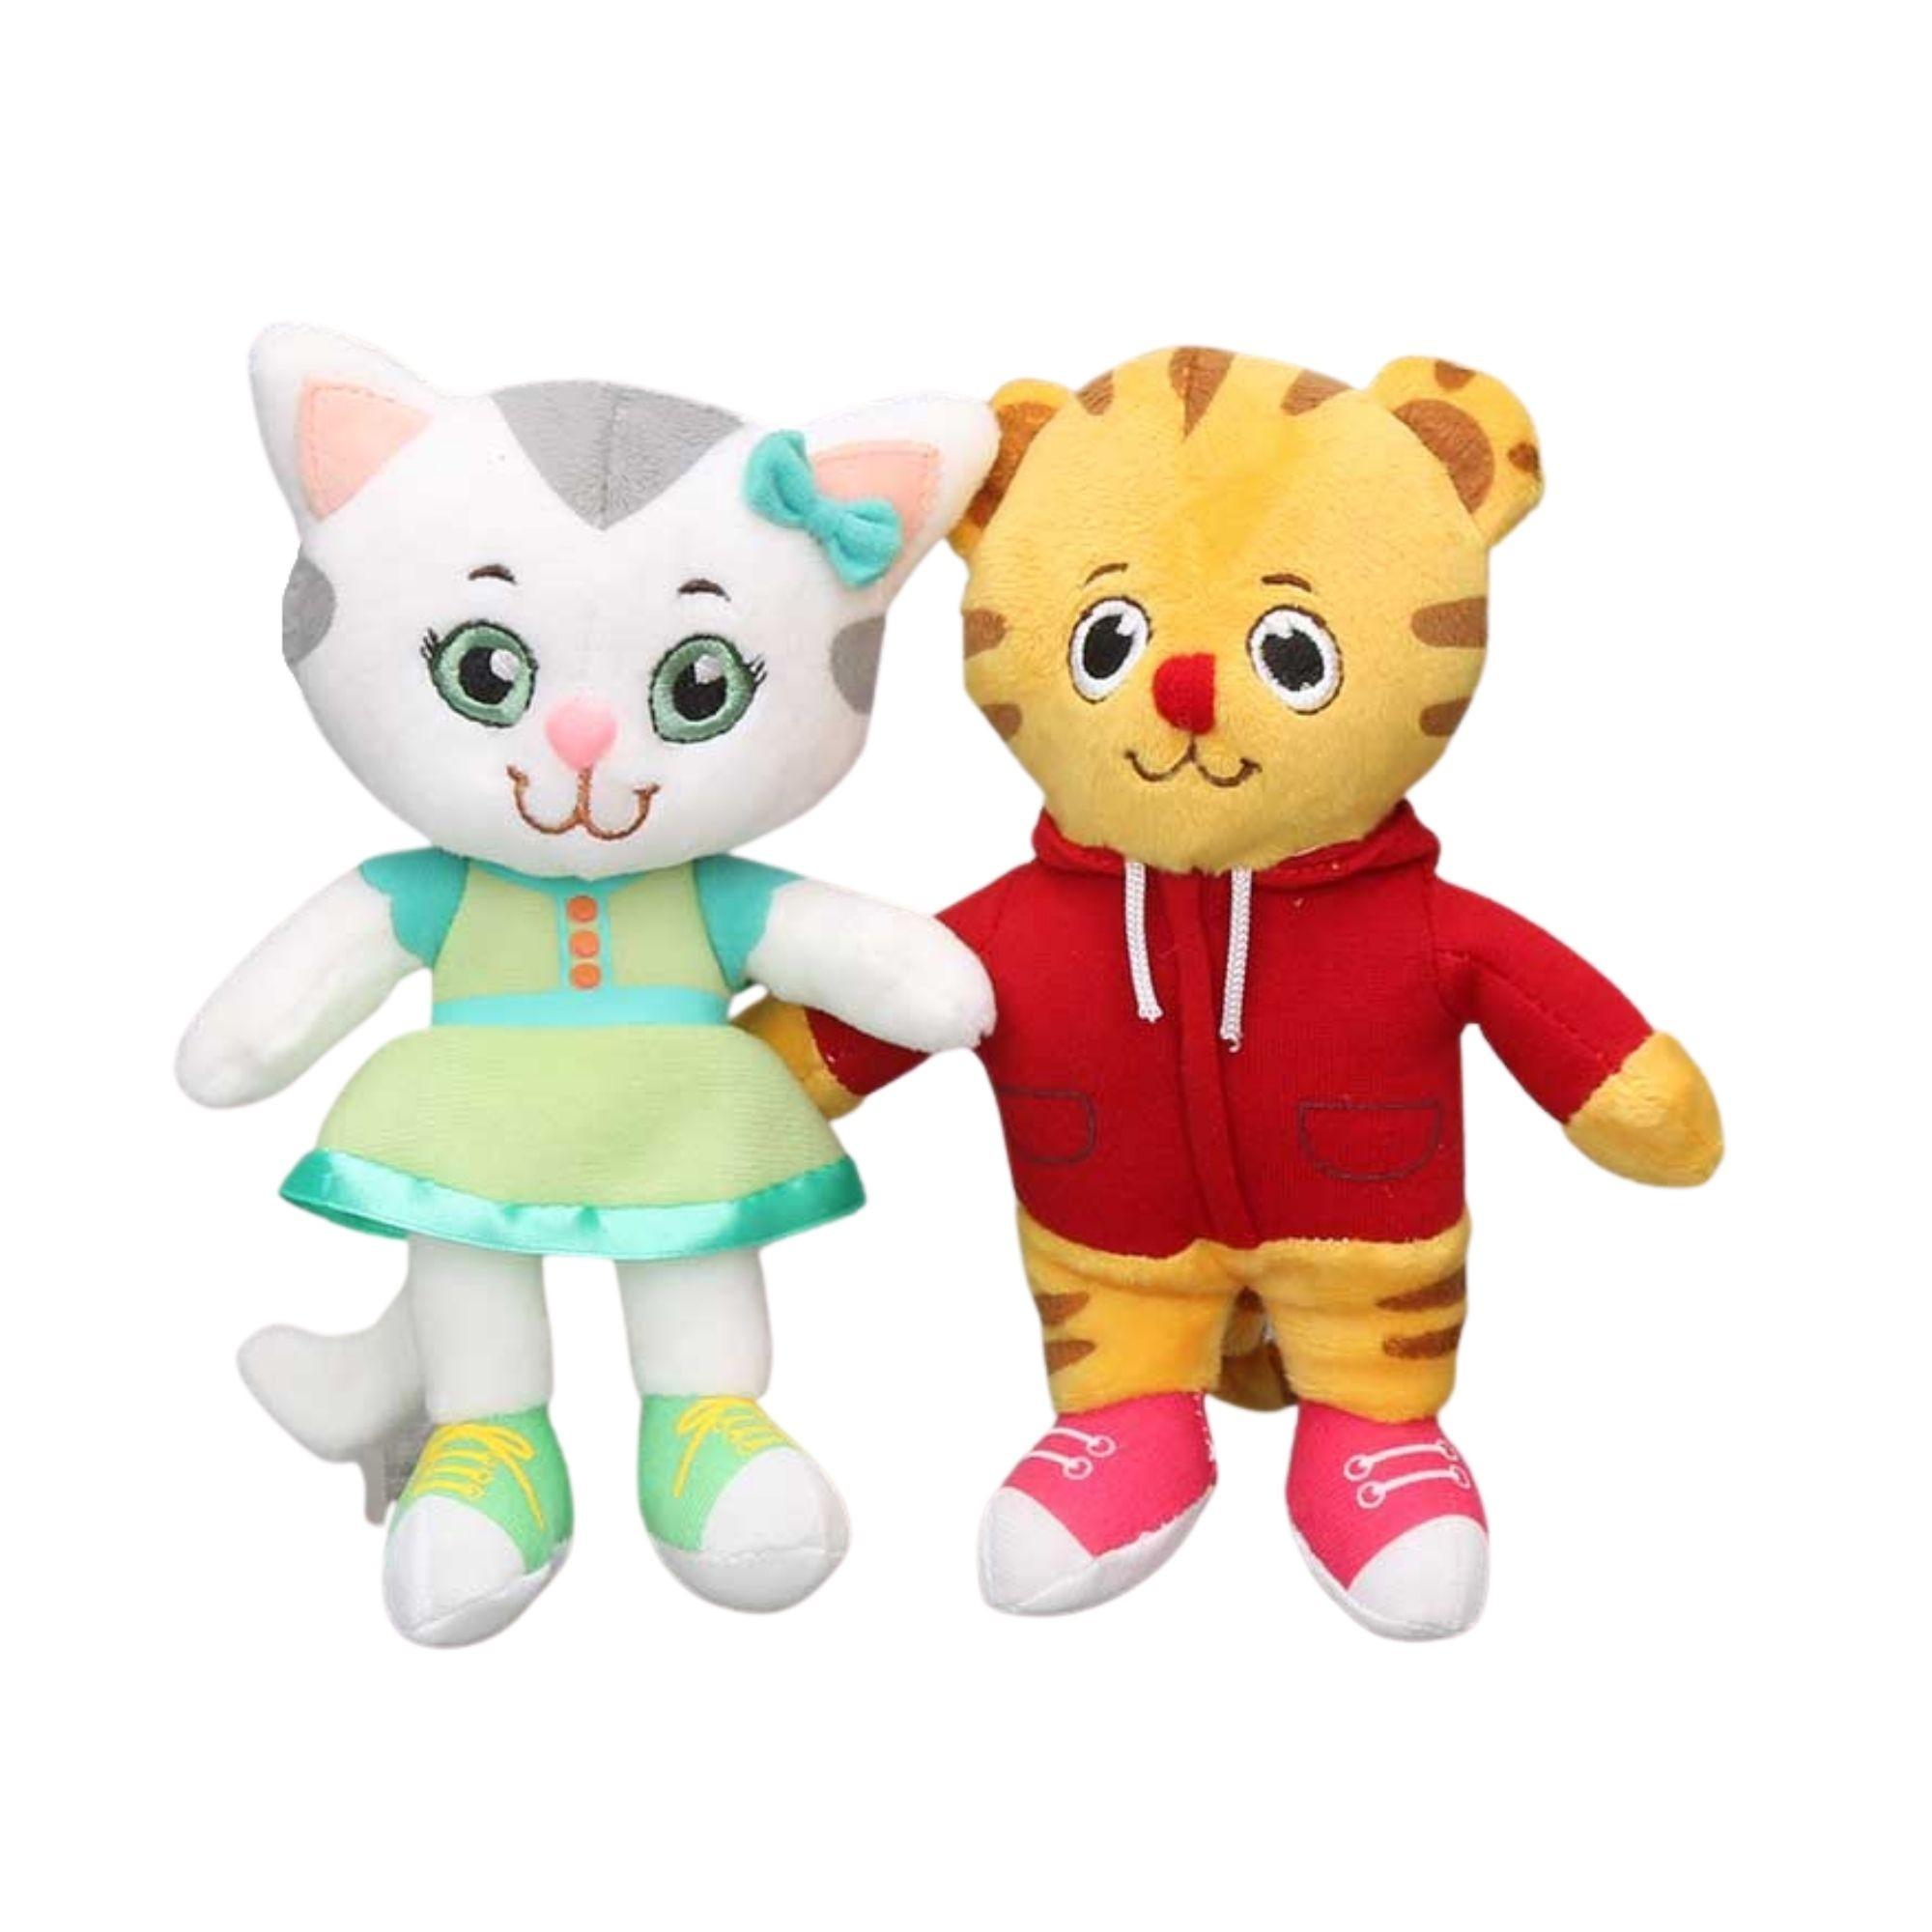 Boneco de Pelucia Daniel Tiger e Katerina Kittycat  - Game Land Brinquedos